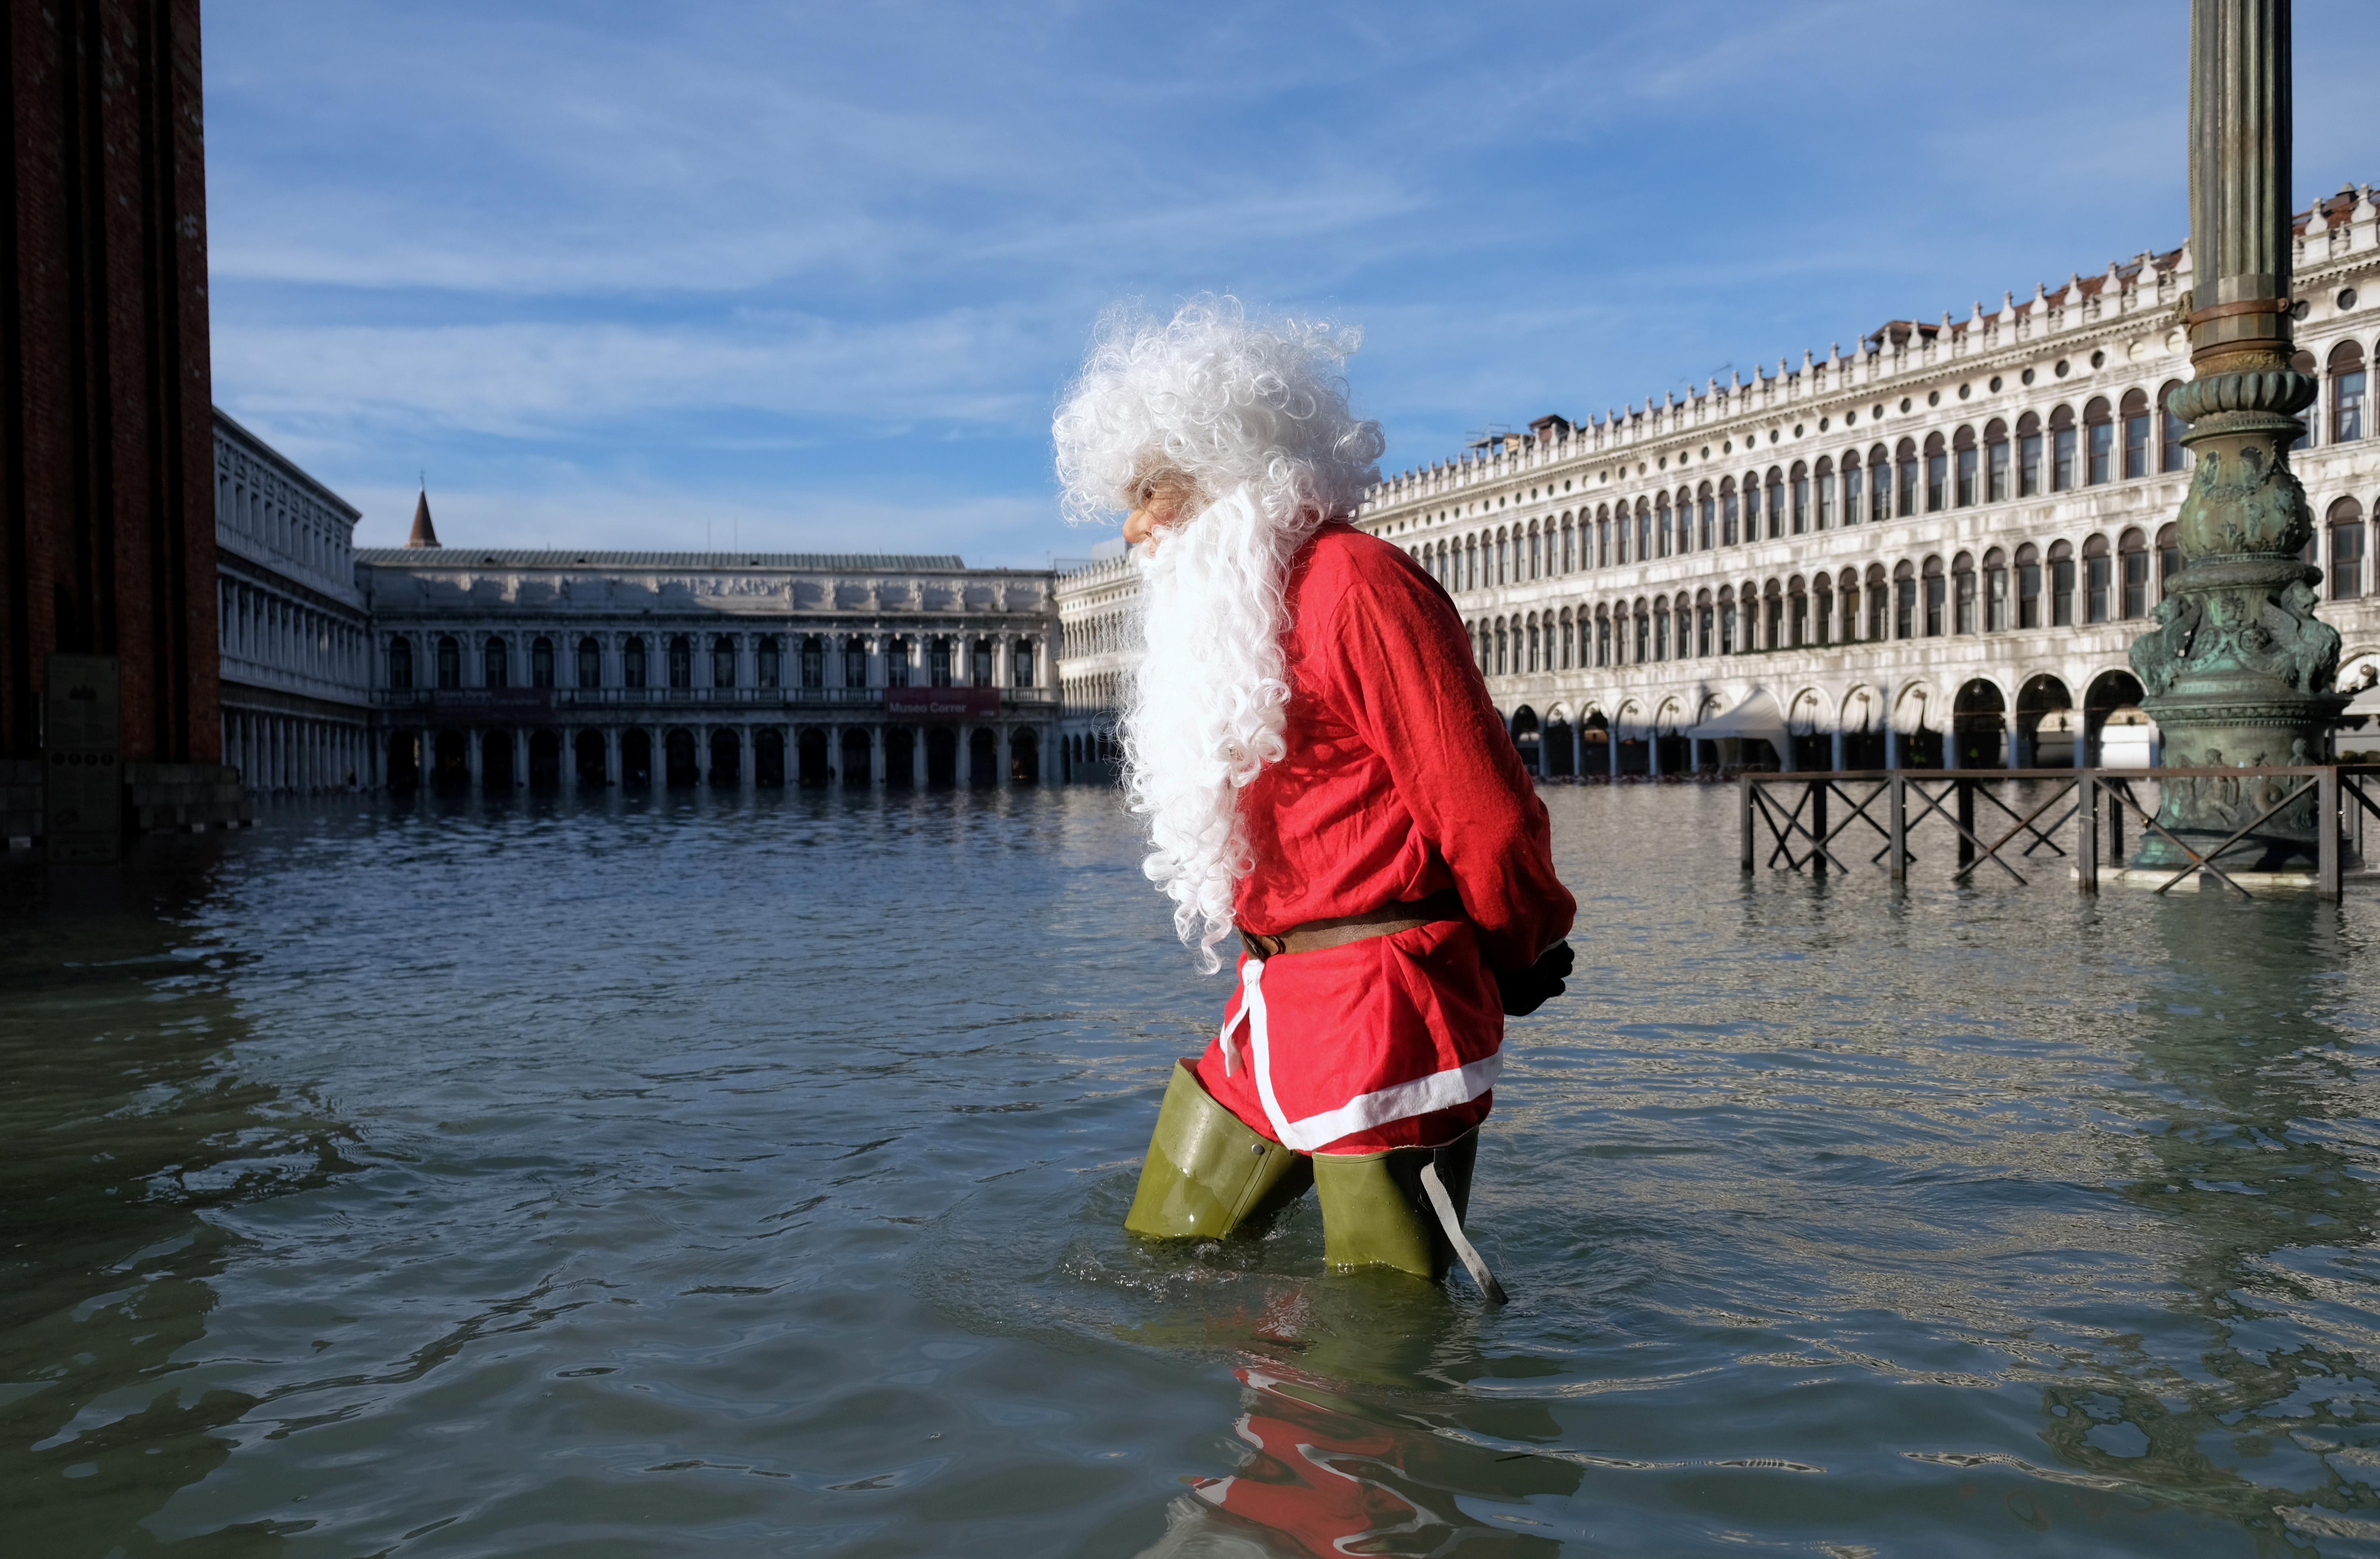 El agua dificultó los preparativos para la Navidad (REUTERS/Manuel Silvestri)